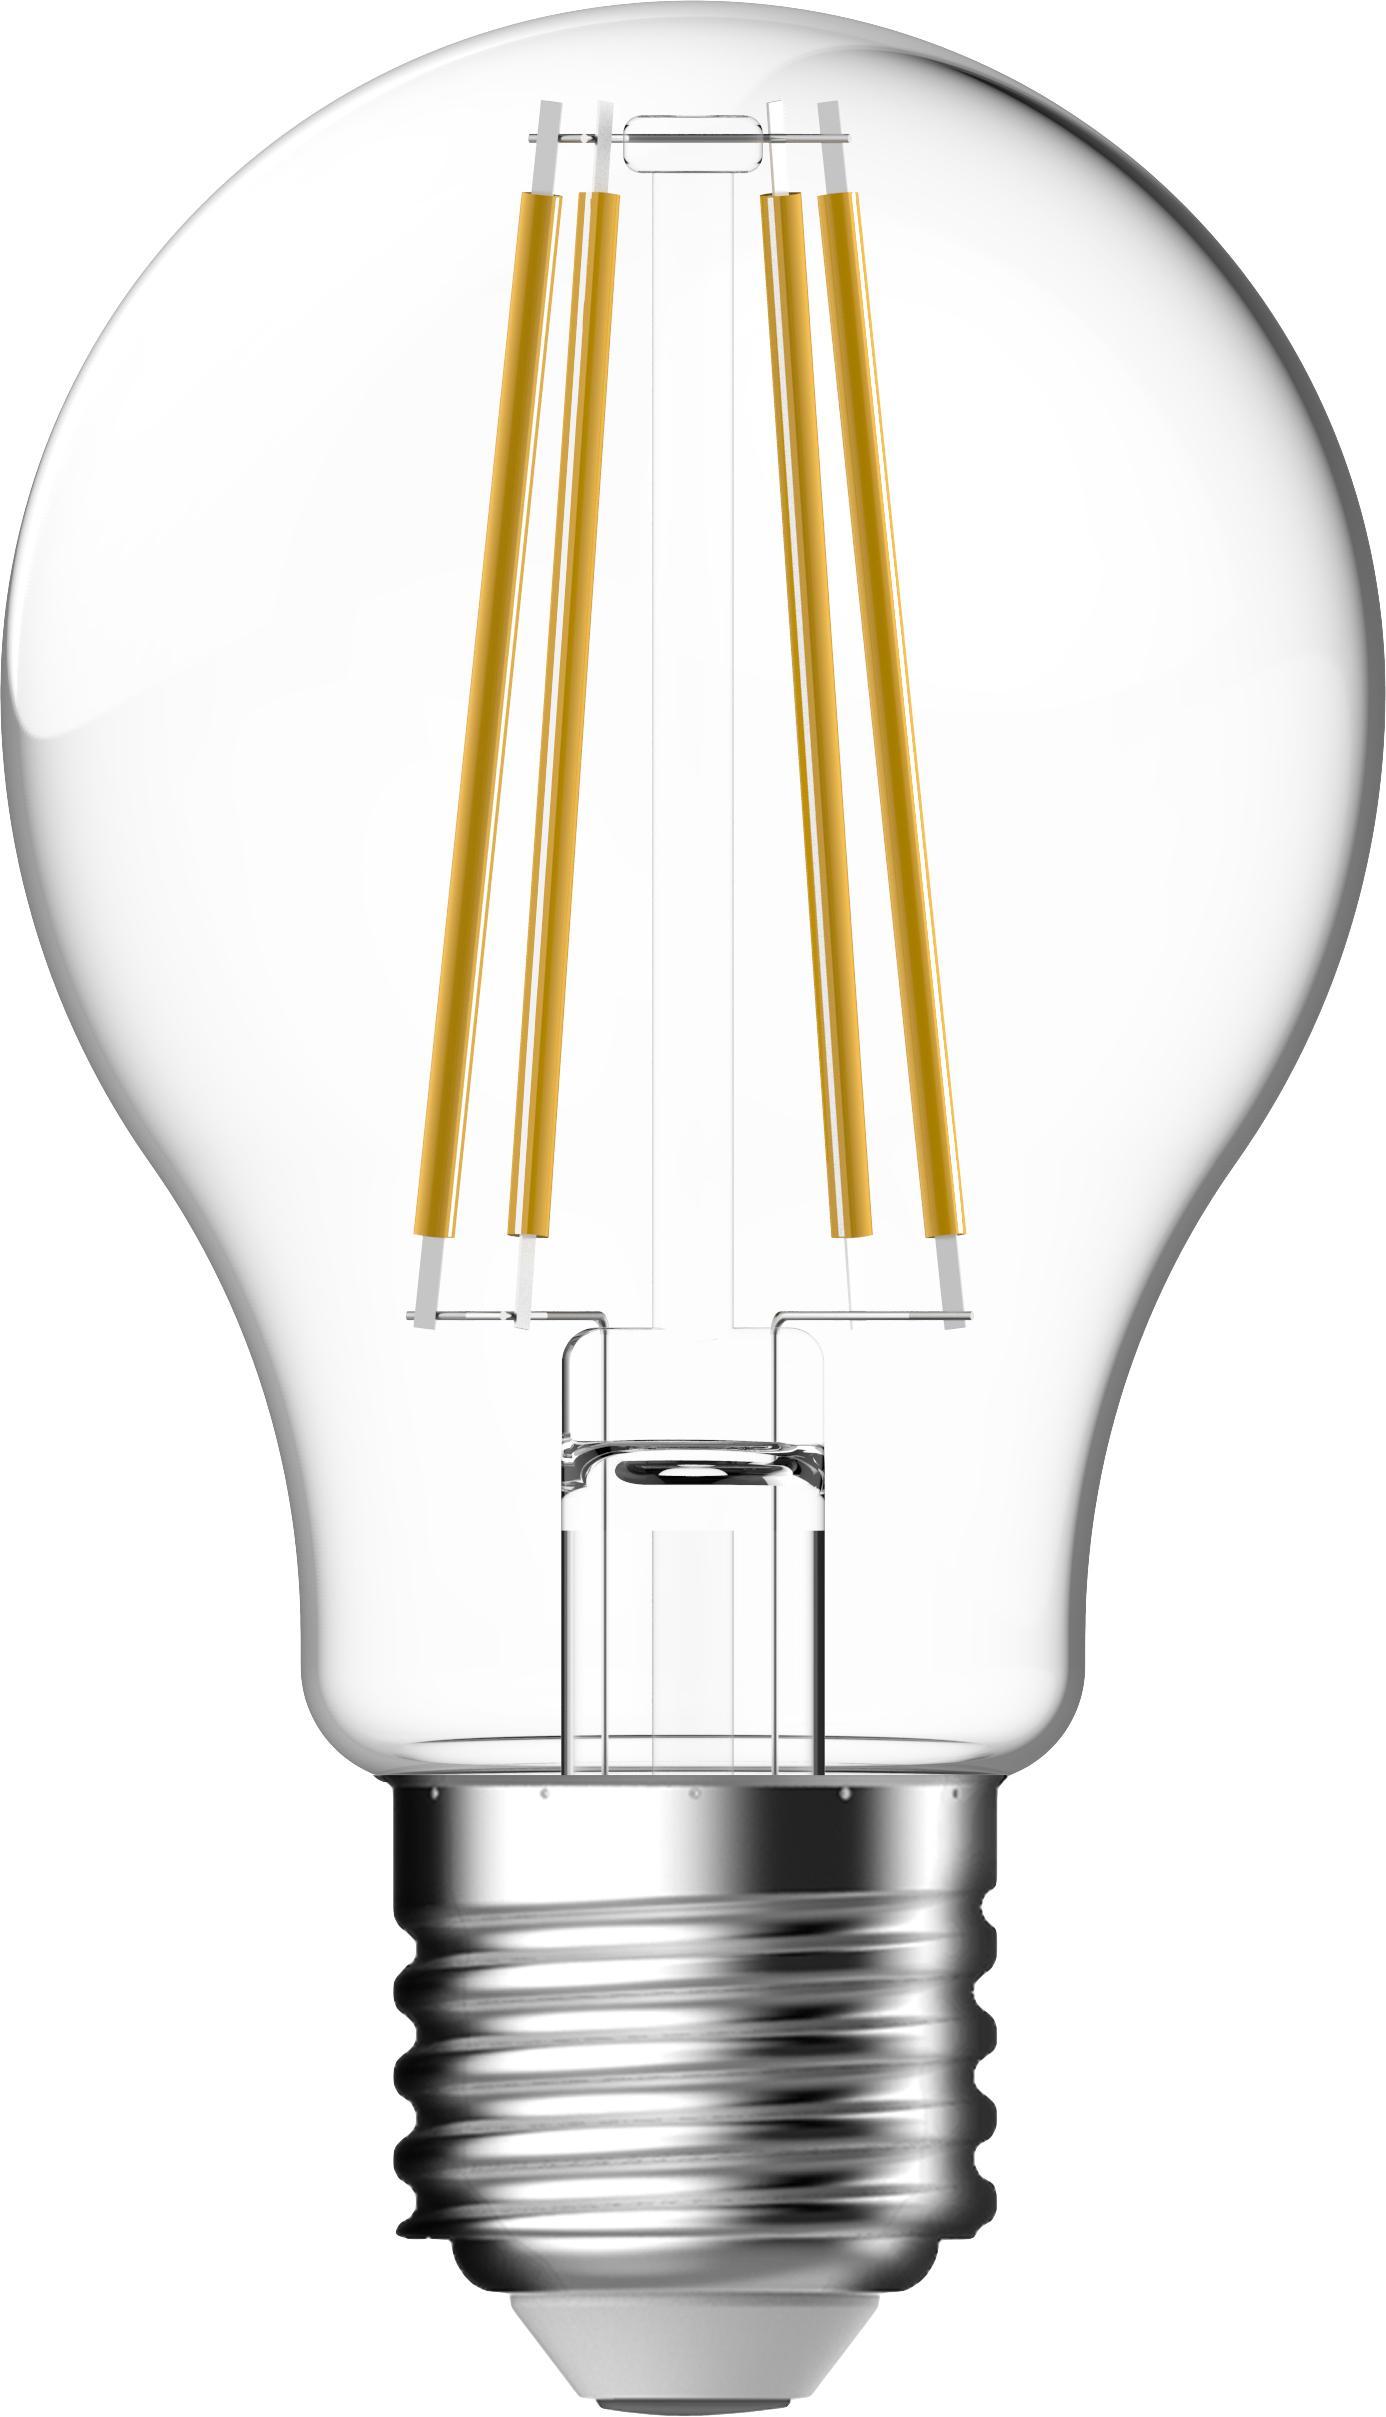 Lampadina a LED Clear (E27 / 7Watt) 2 pz, Paralume: vetro, Base lampadina: alluminio, Trasparente, Ø 6 x Alt. 11 cm